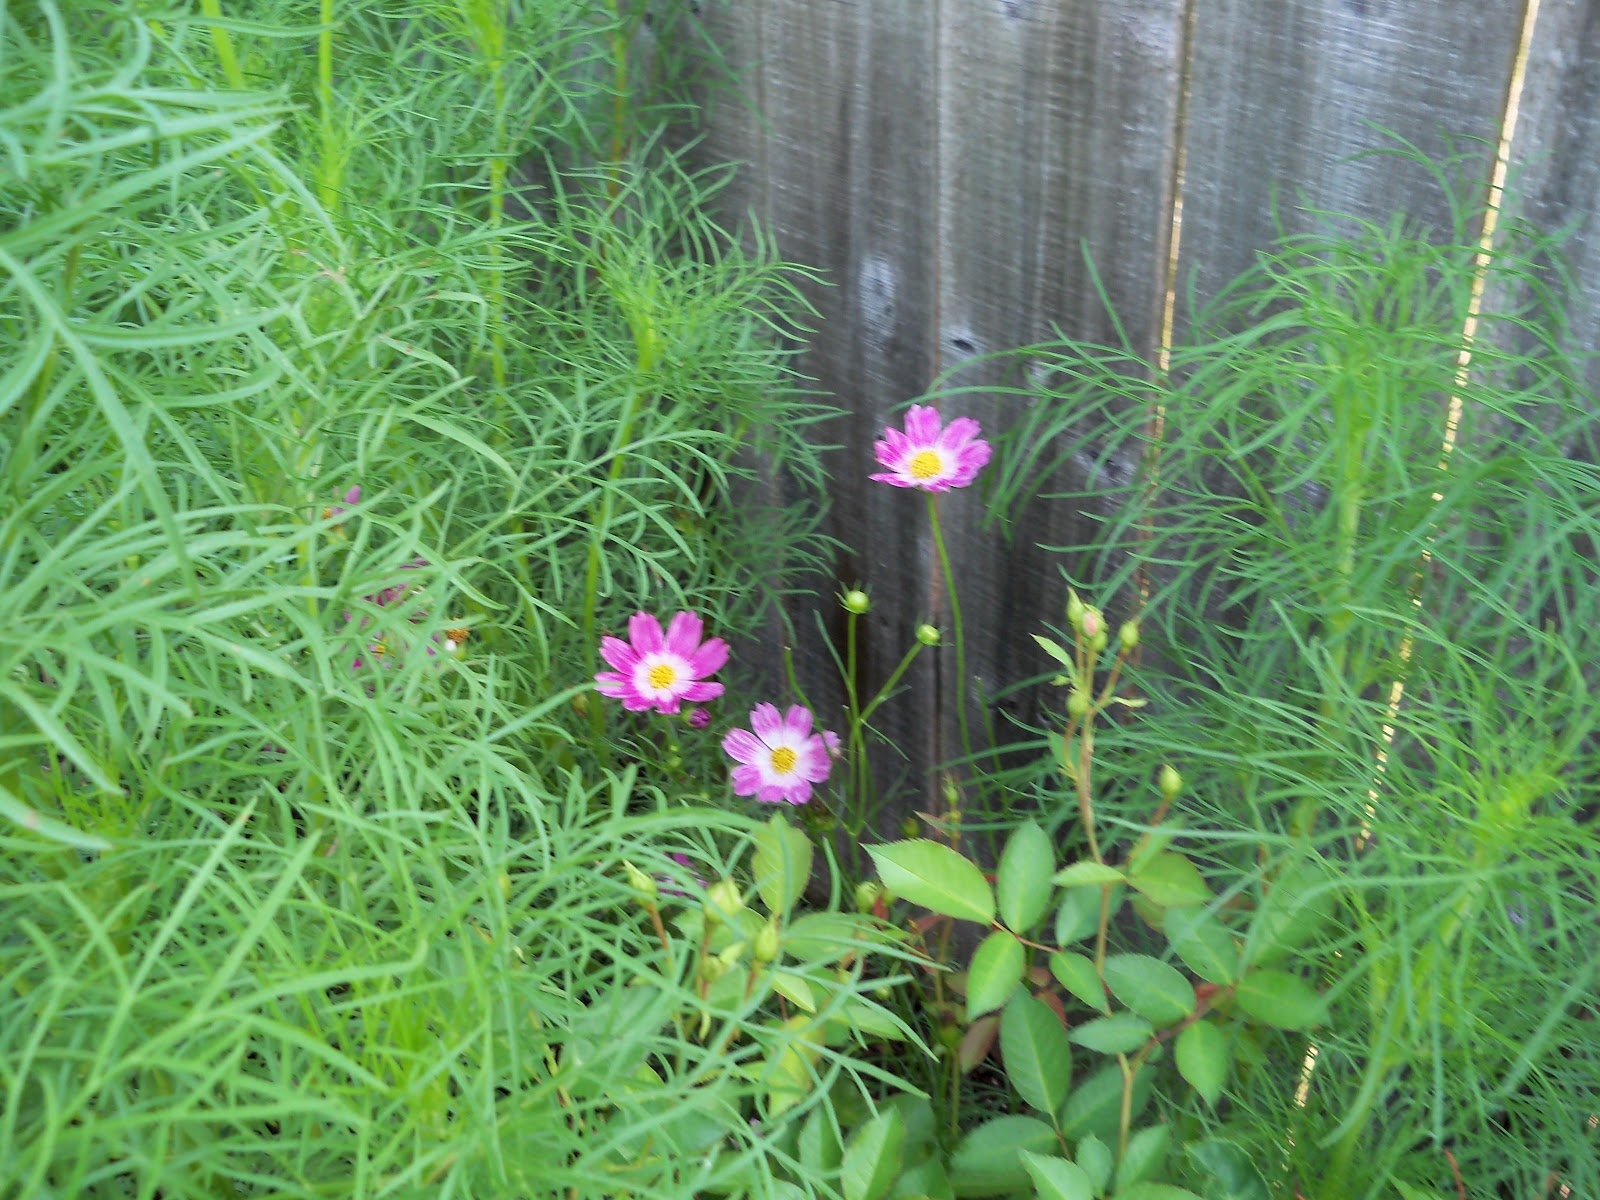 Gardening 2010, Part Two - 101_3276.JPG